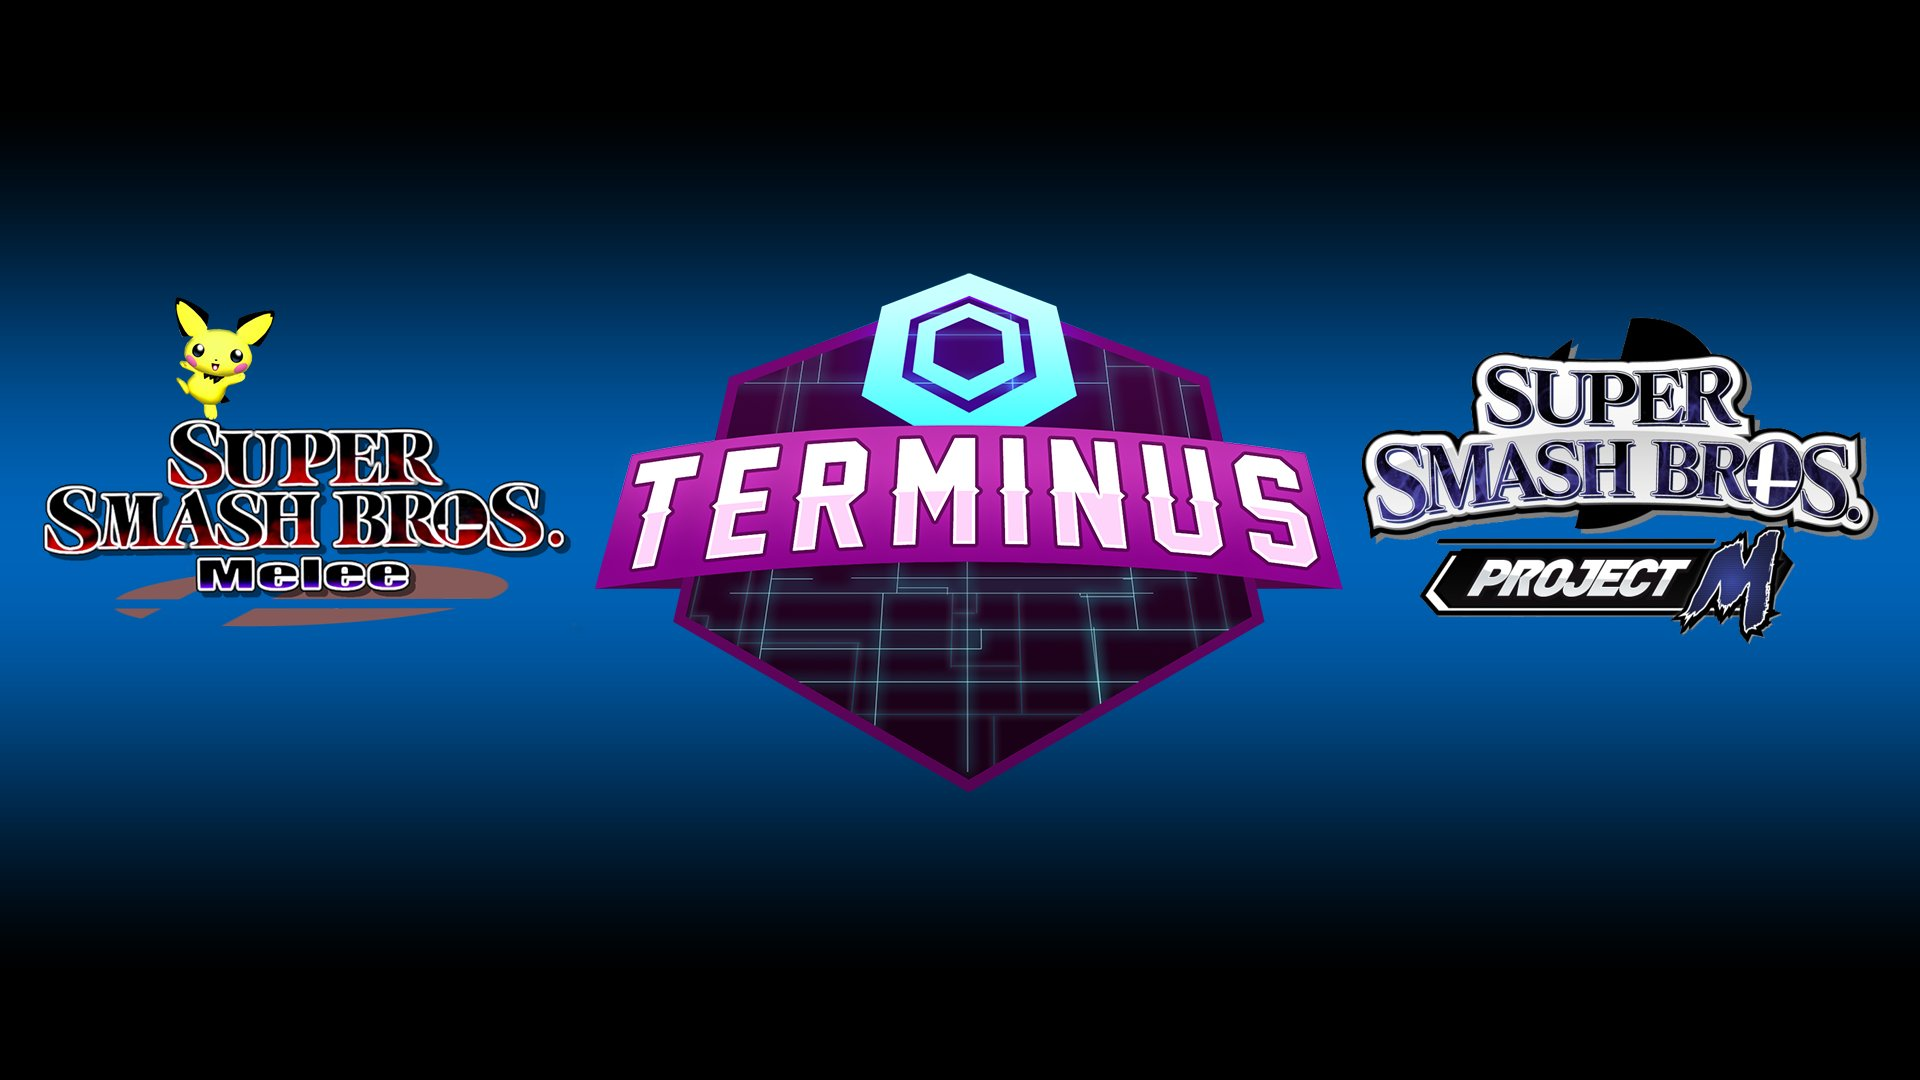 Terminus 2 - Project M Singles